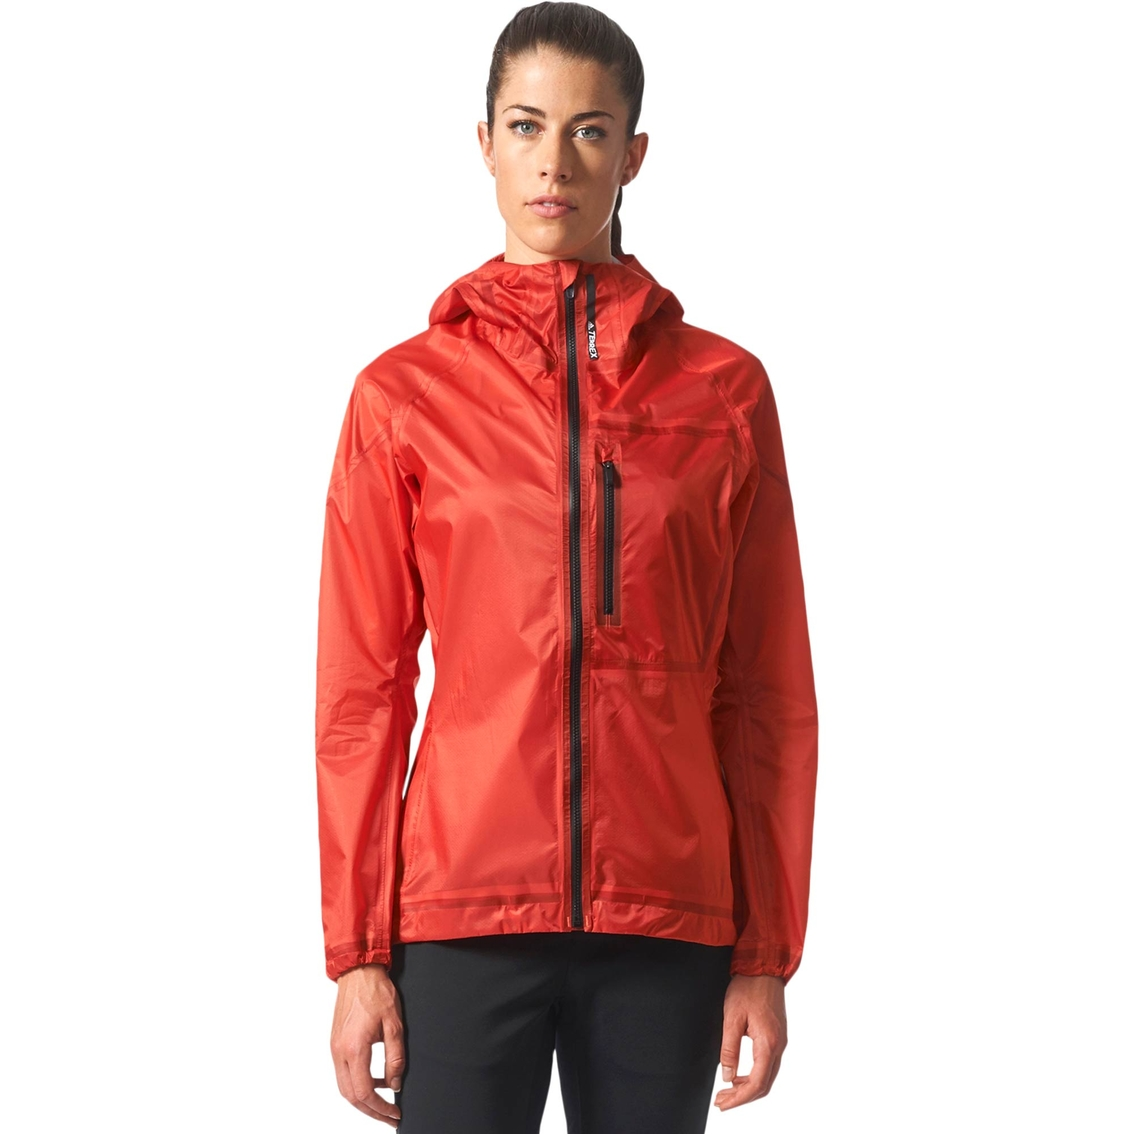 Adidas Outdoor Terrex Agravic 3l Jacket | Jackets | Apparel